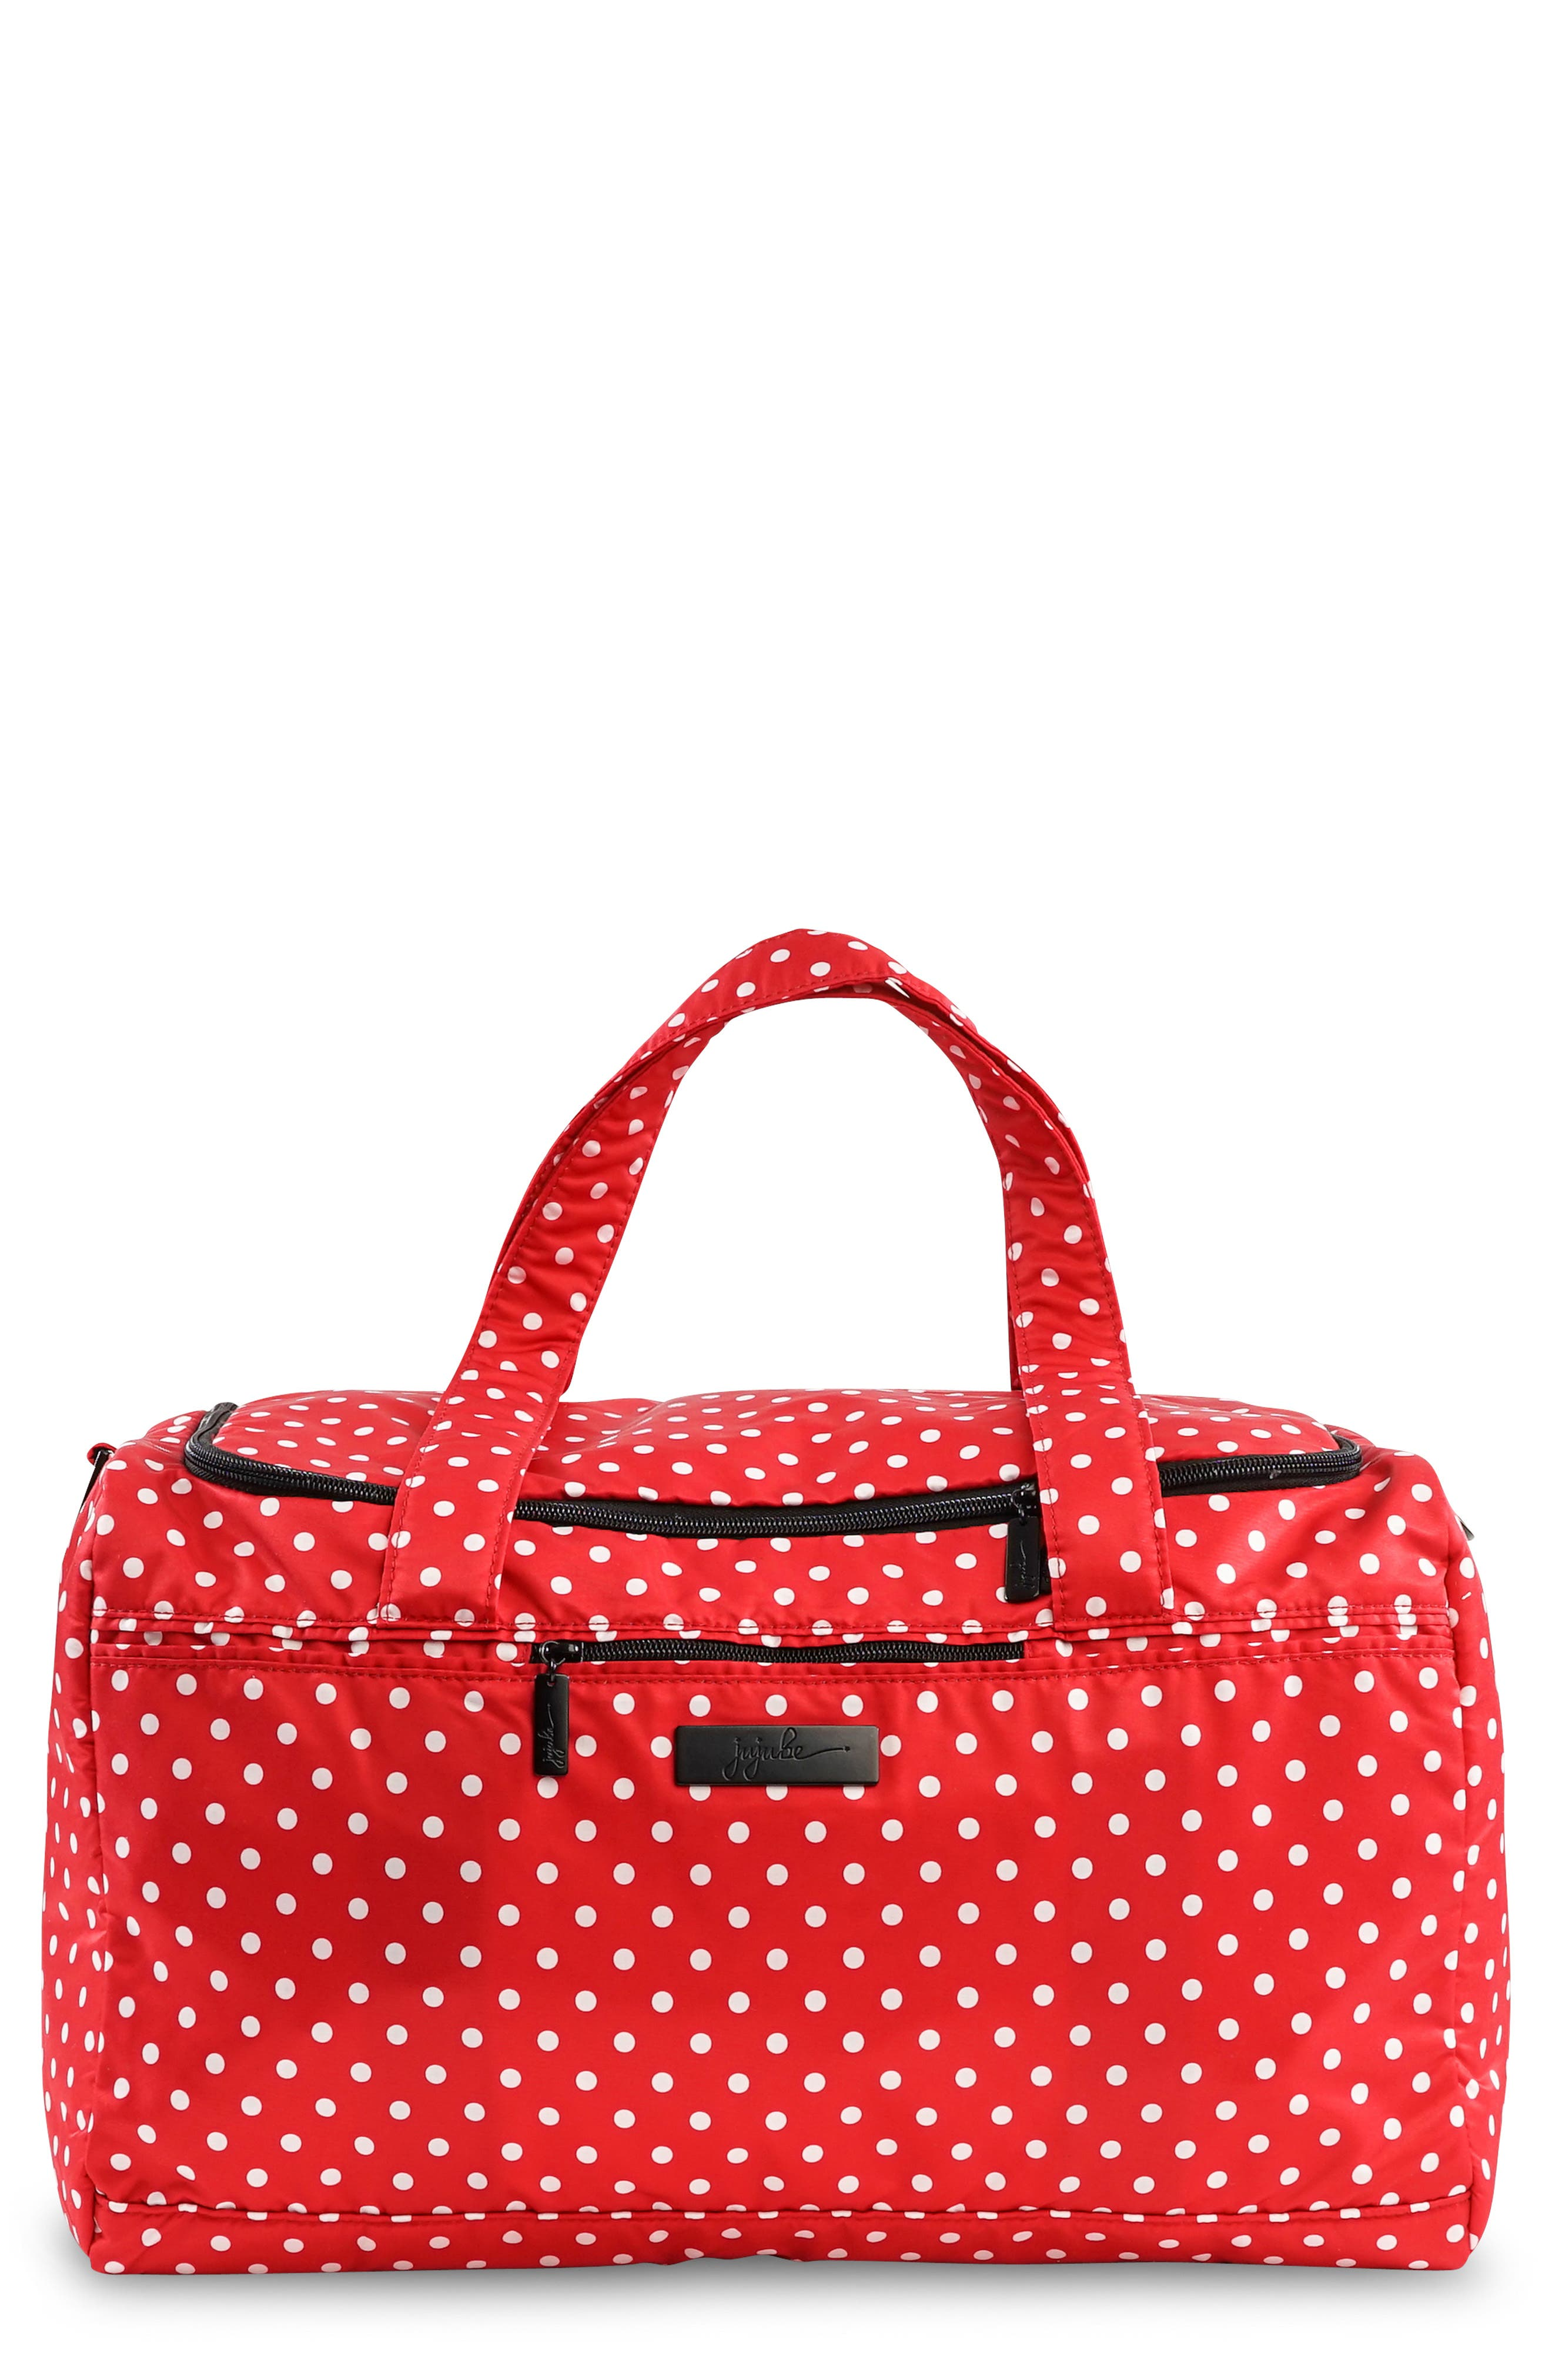 Onyx Super Star Diaper Bag,                         Main,                         color, BLACK RUBY